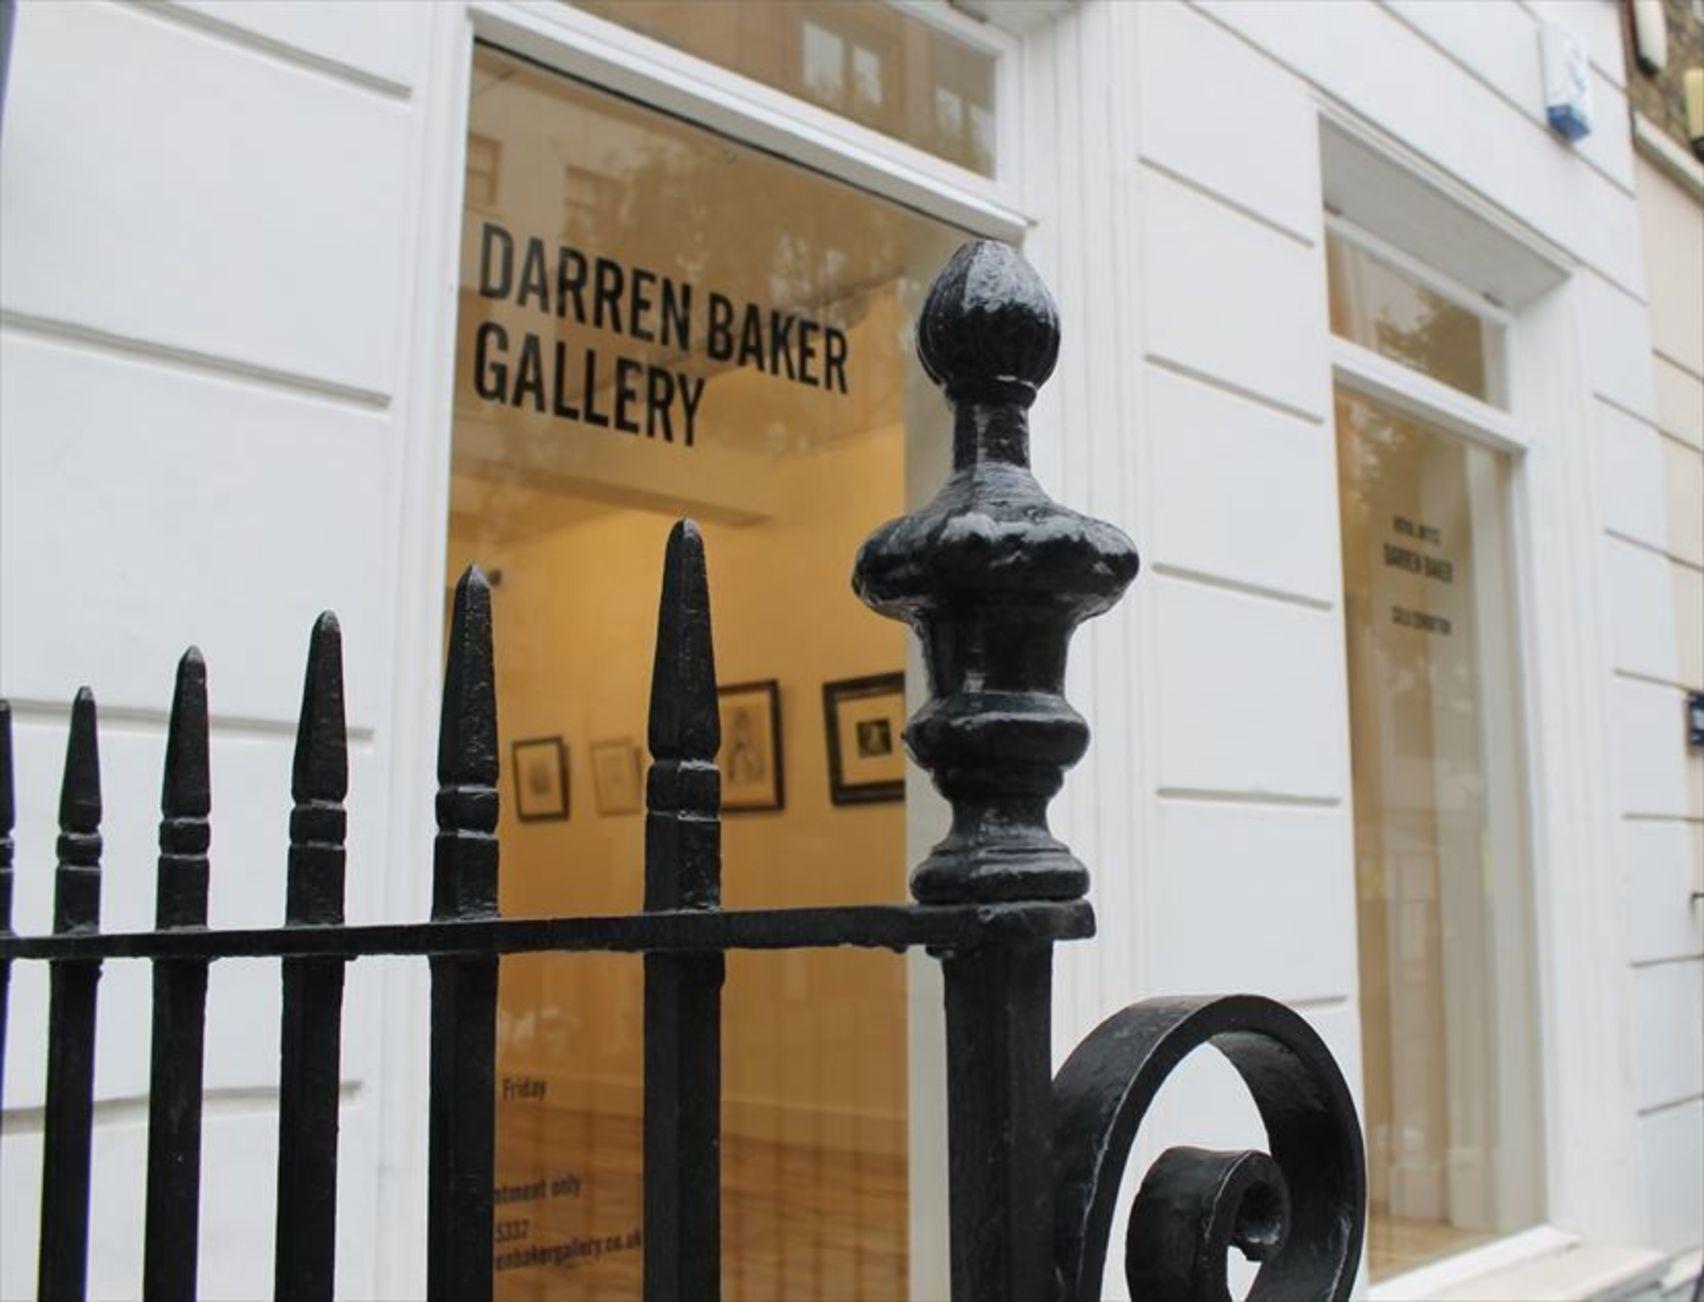 Day Hire, Full Gallery, Darren Baker Gallery